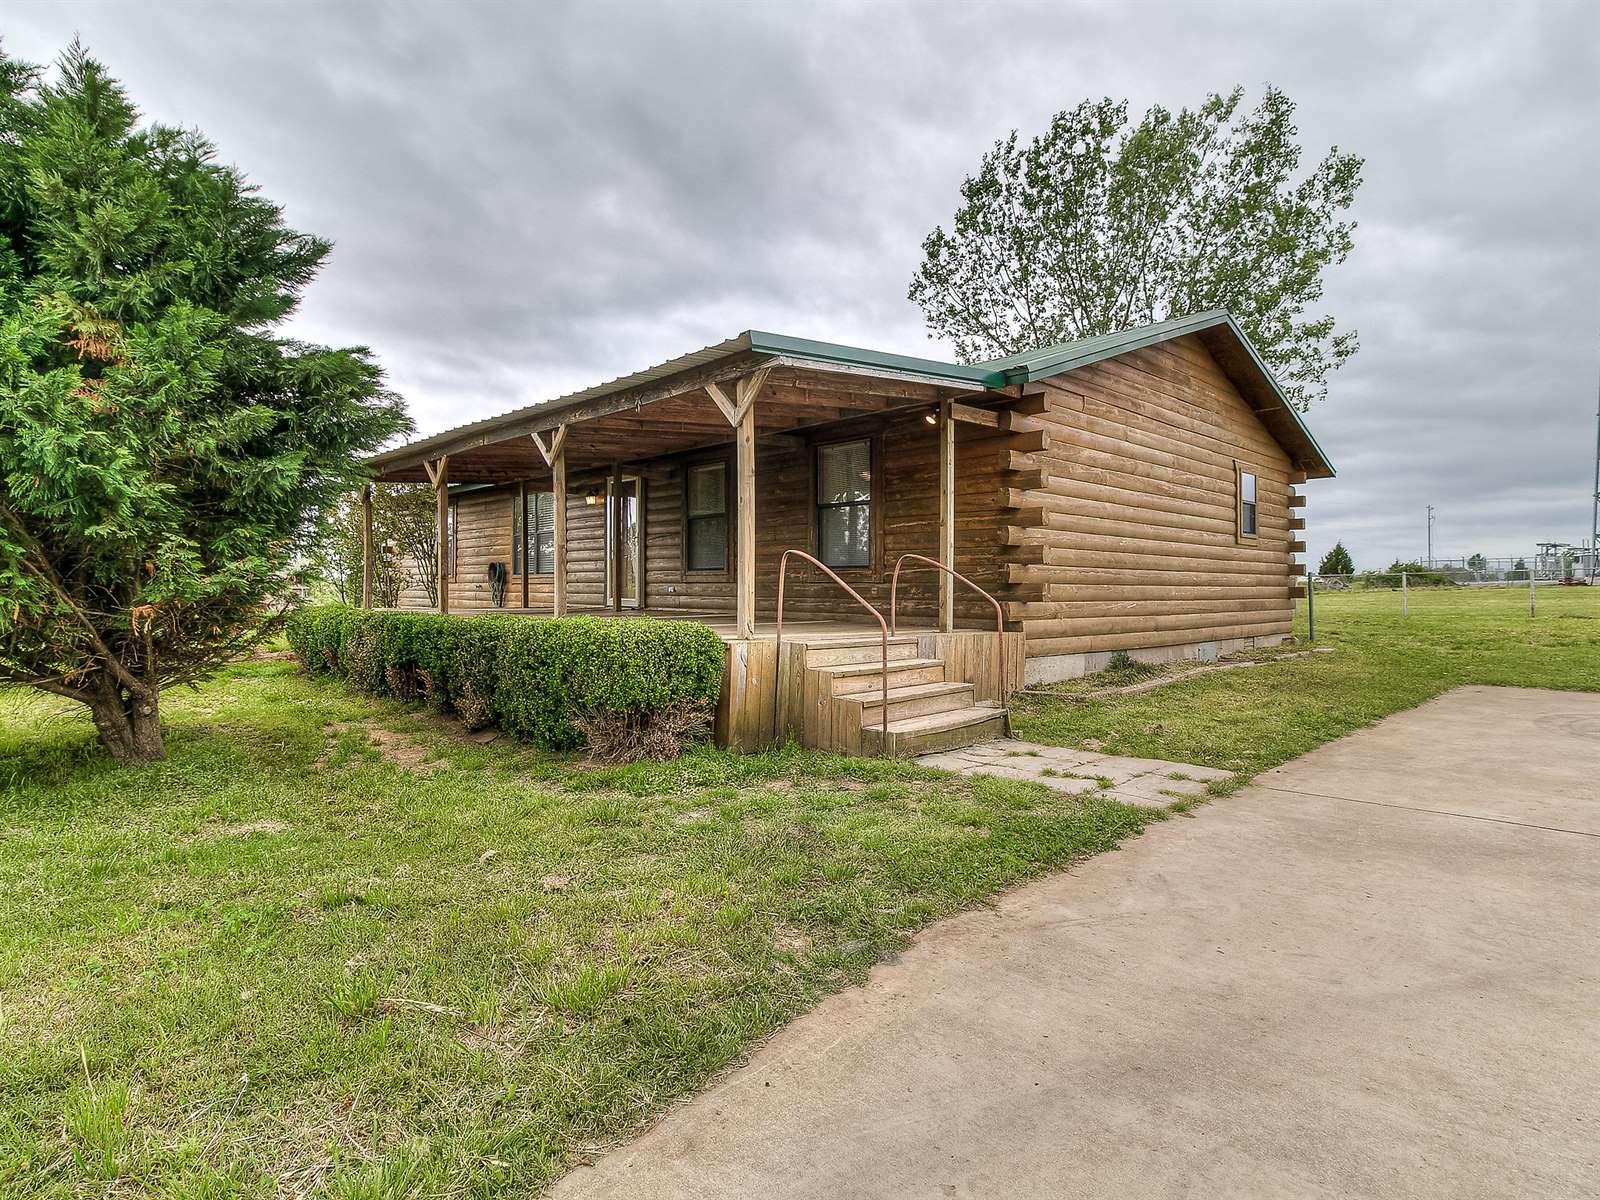 13200 Coker Rd, Shawnee, OK 74804